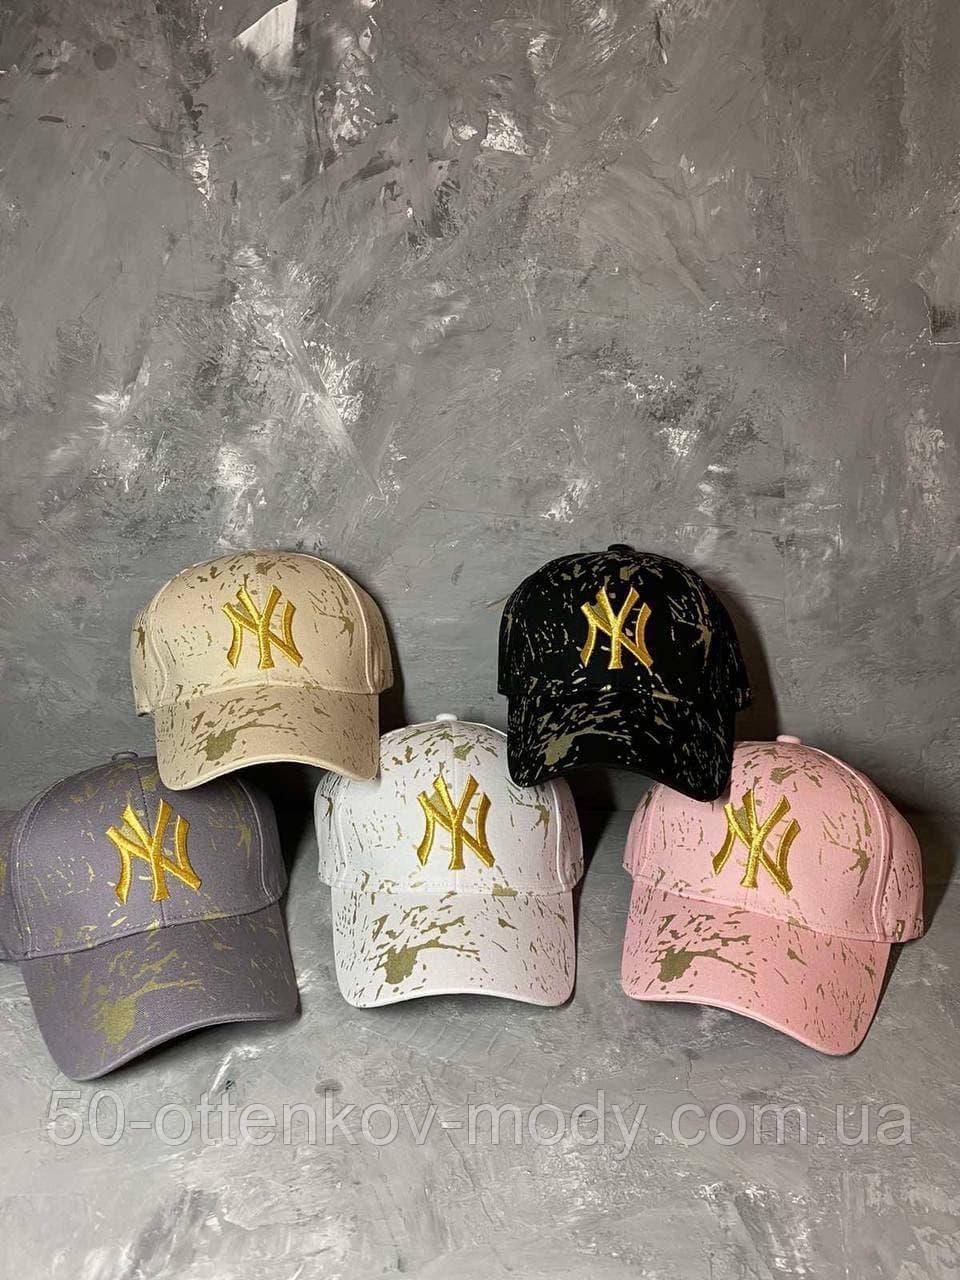 Женская бейсболка кепка NY с логотипом